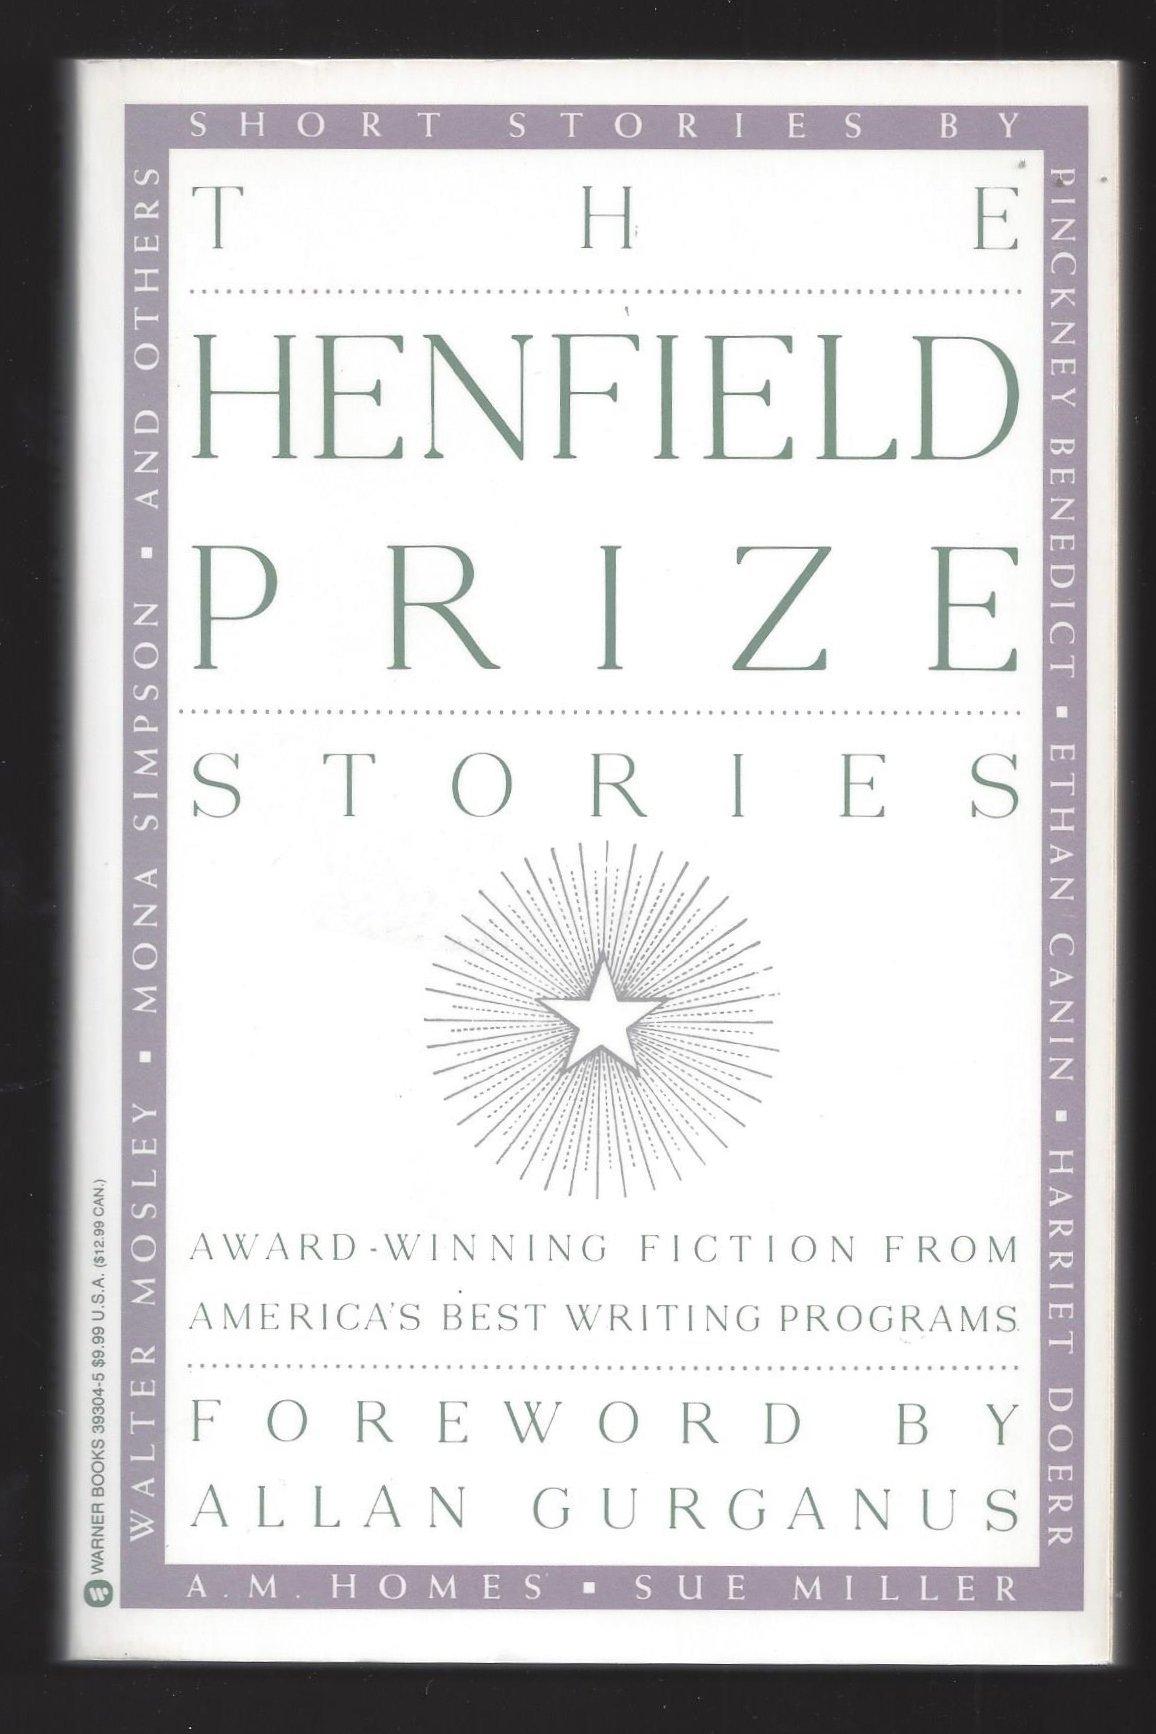 The henfield prize stories john birmingham laura gilpin joseph f the henfield prize stories john birmingham laura gilpin joseph f mccrindle 9780446393041 amazon books fandeluxe Choice Image